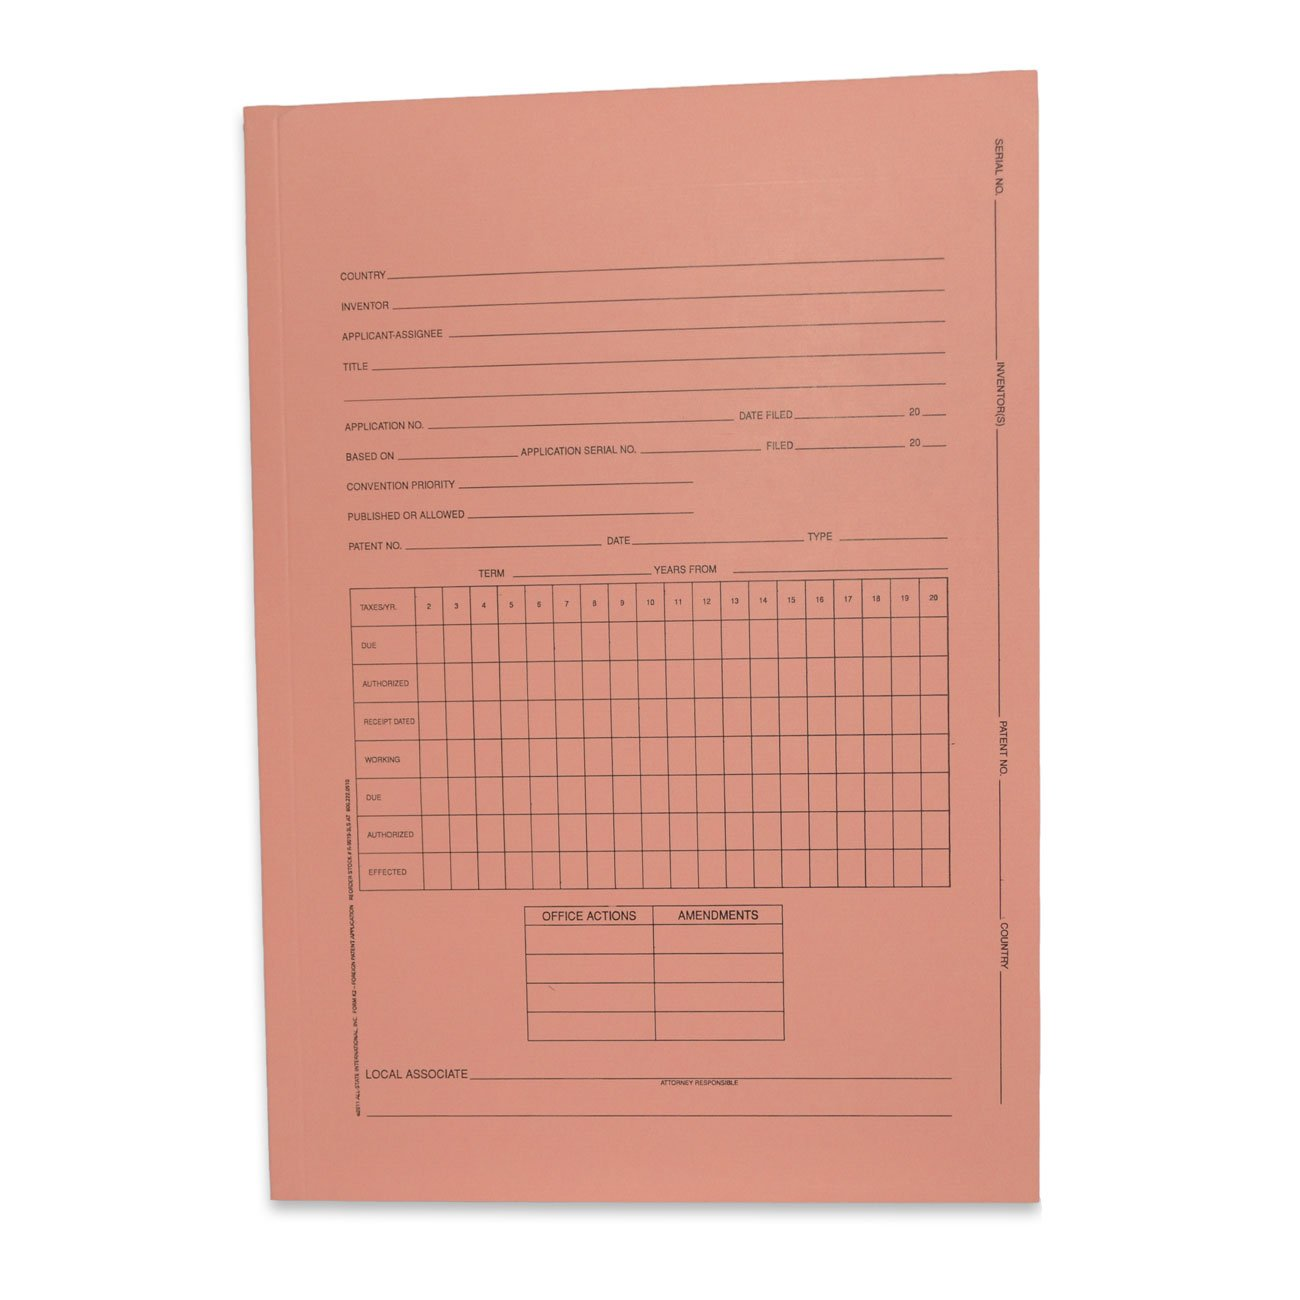 Kruysman/Redweld Patent Folder, Foreign Patent Application, 3 Panel, 10 1/4'' x 14 1/2'' When Folded, Salmon, 100 per Box